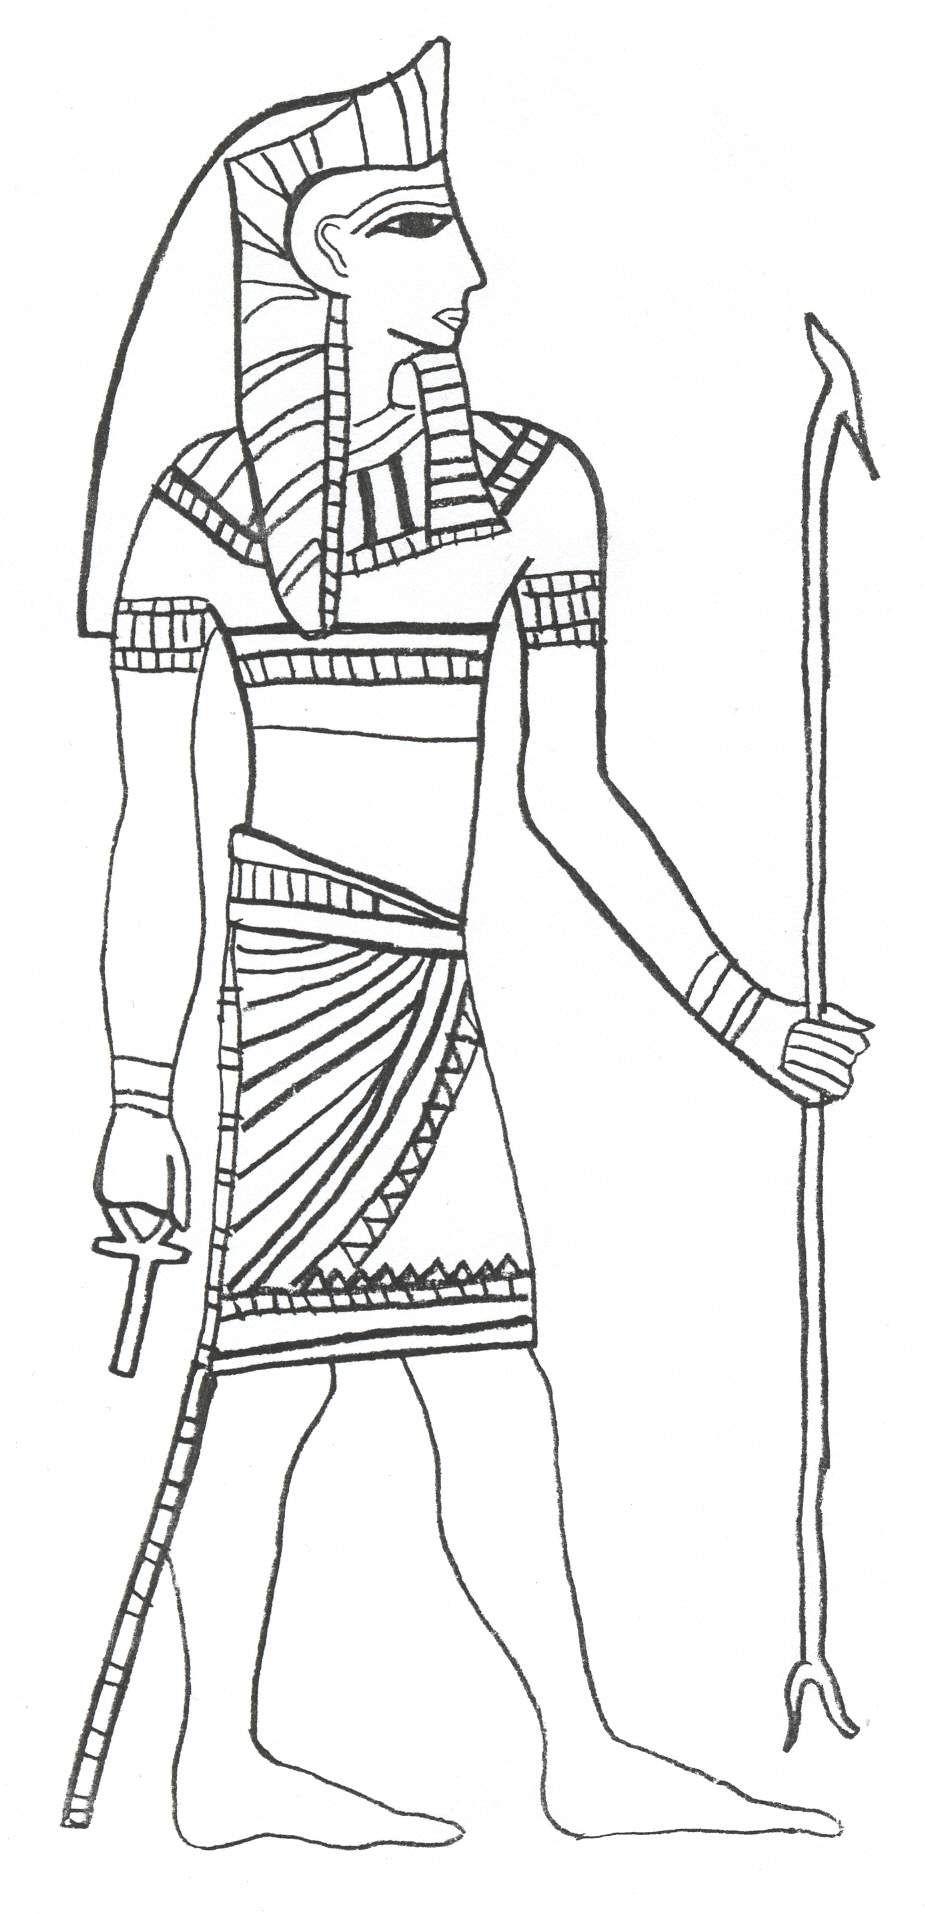 Pin von f capewell auf Egypt | Pinterest | Mandala malvorlagen ...